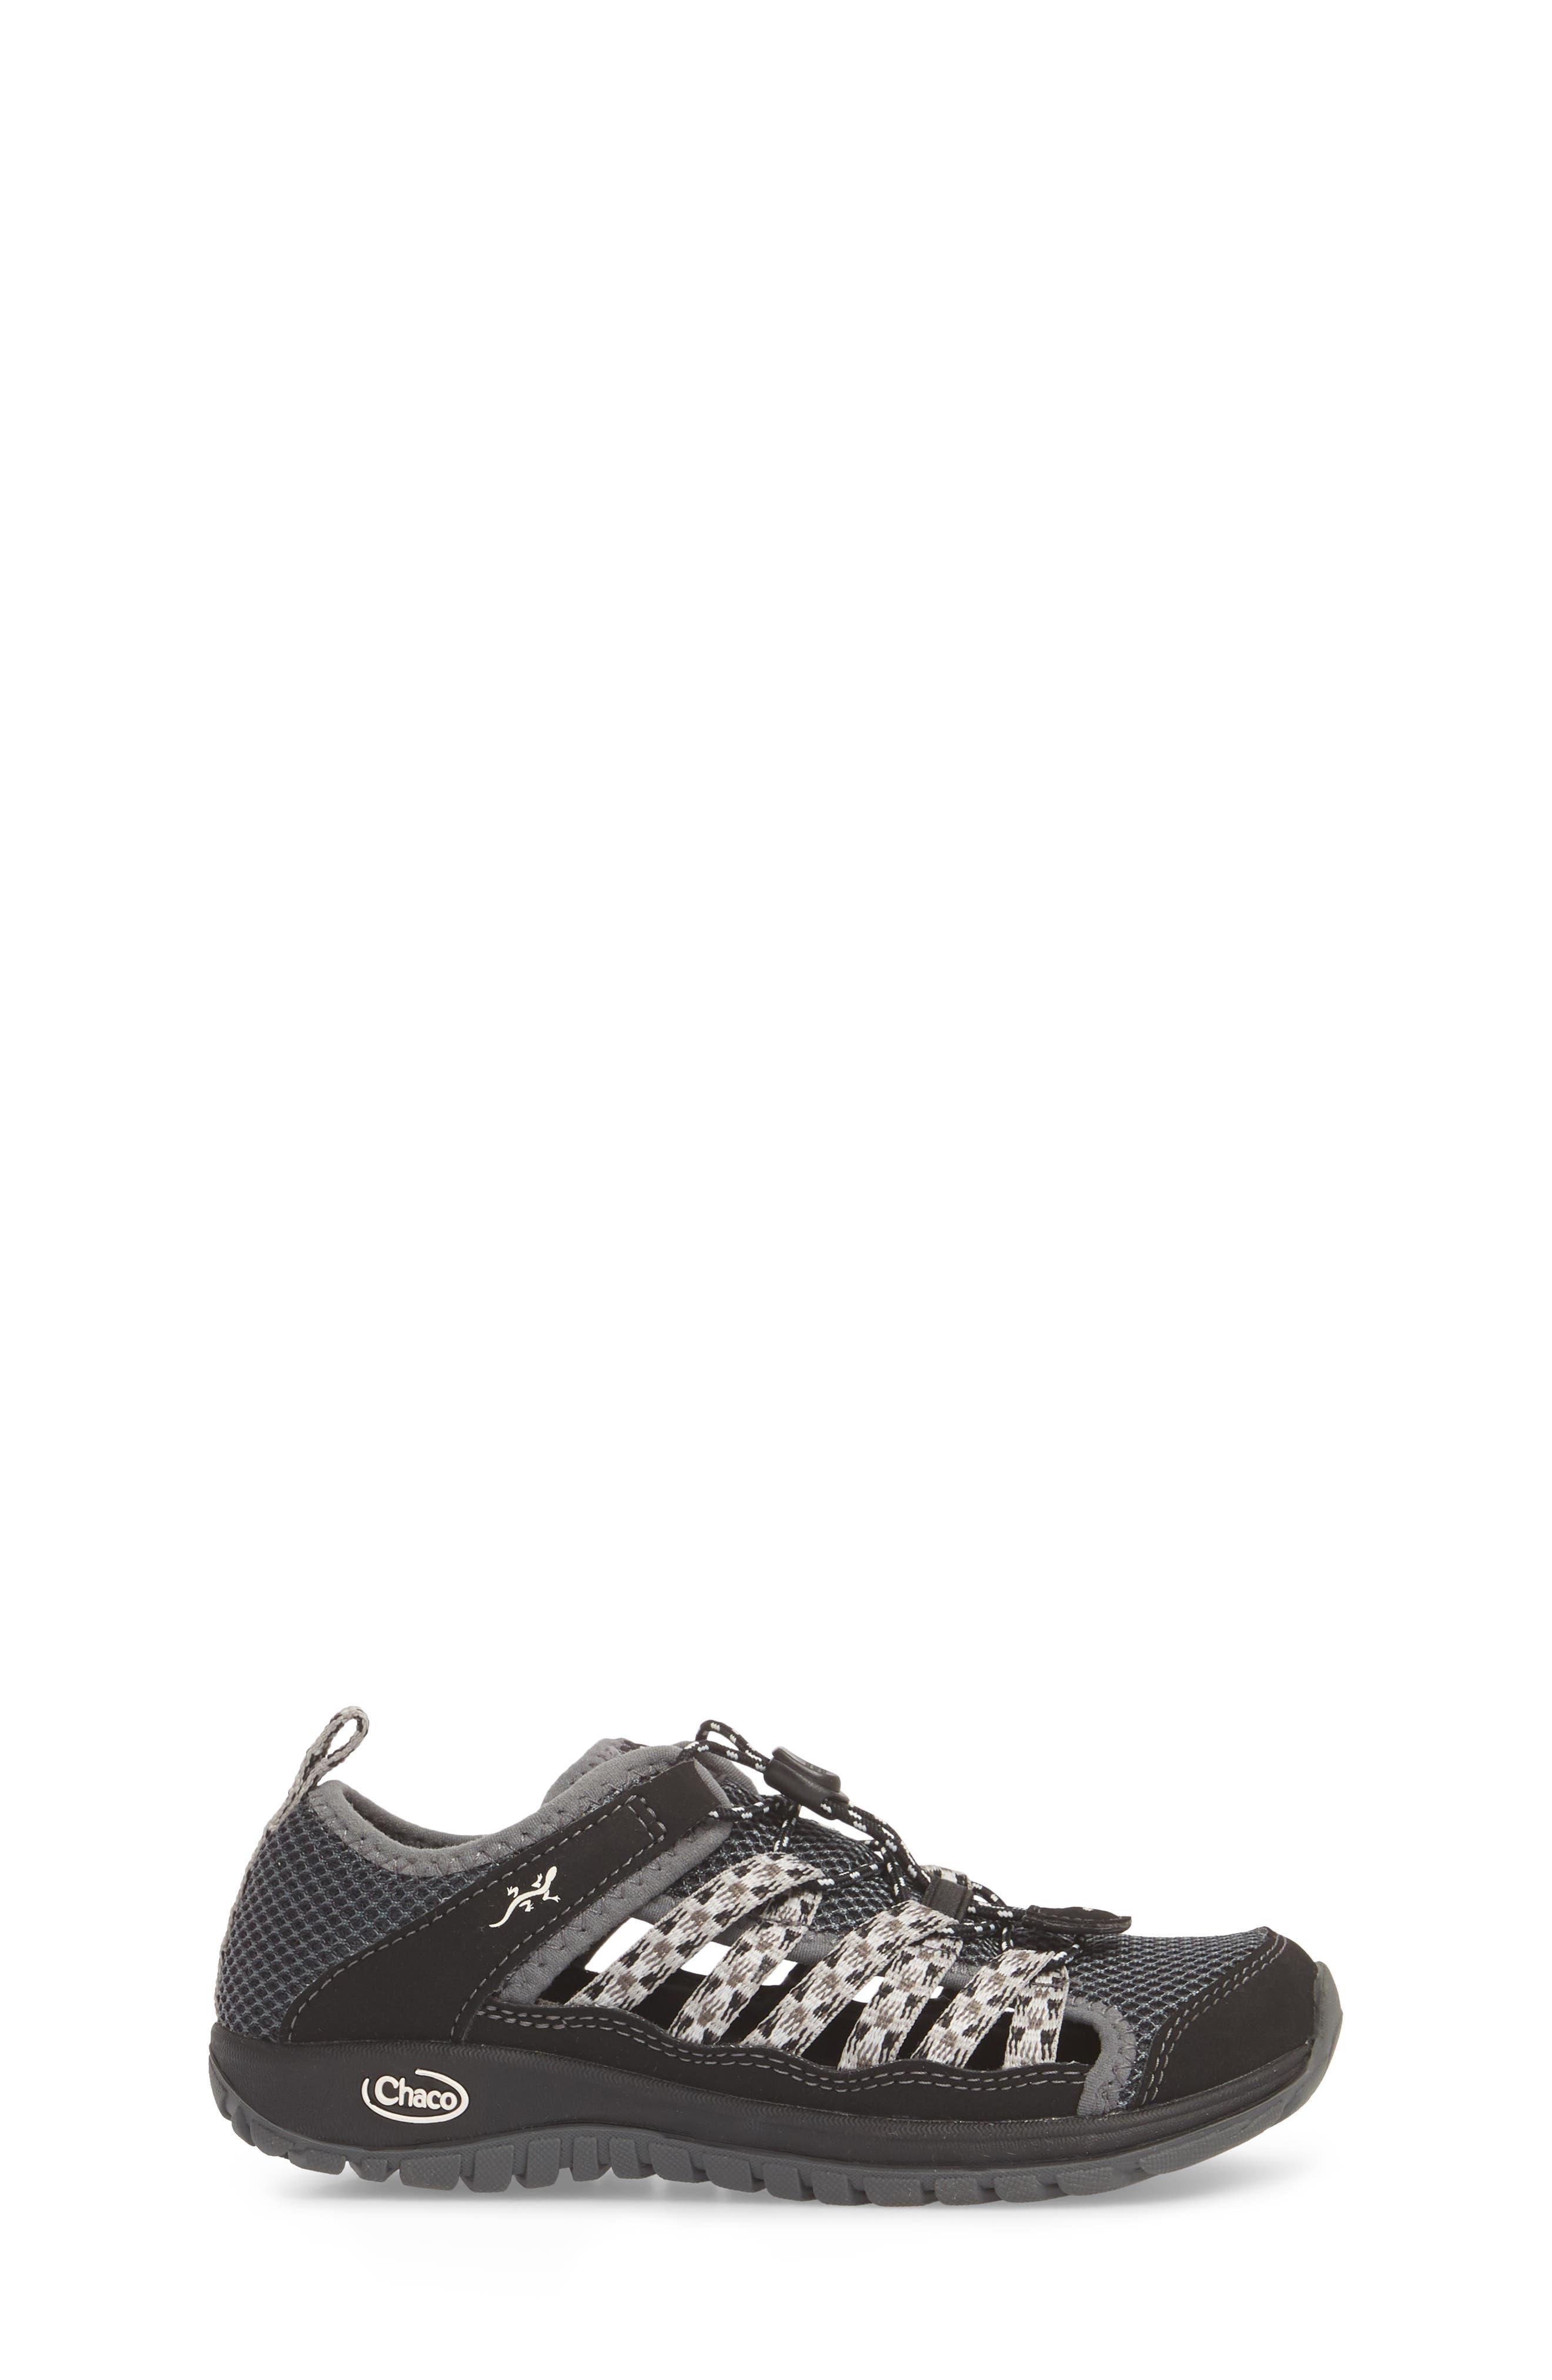 Outcross 2 Water Sneaker,                             Alternate thumbnail 3, color,                             BLACK